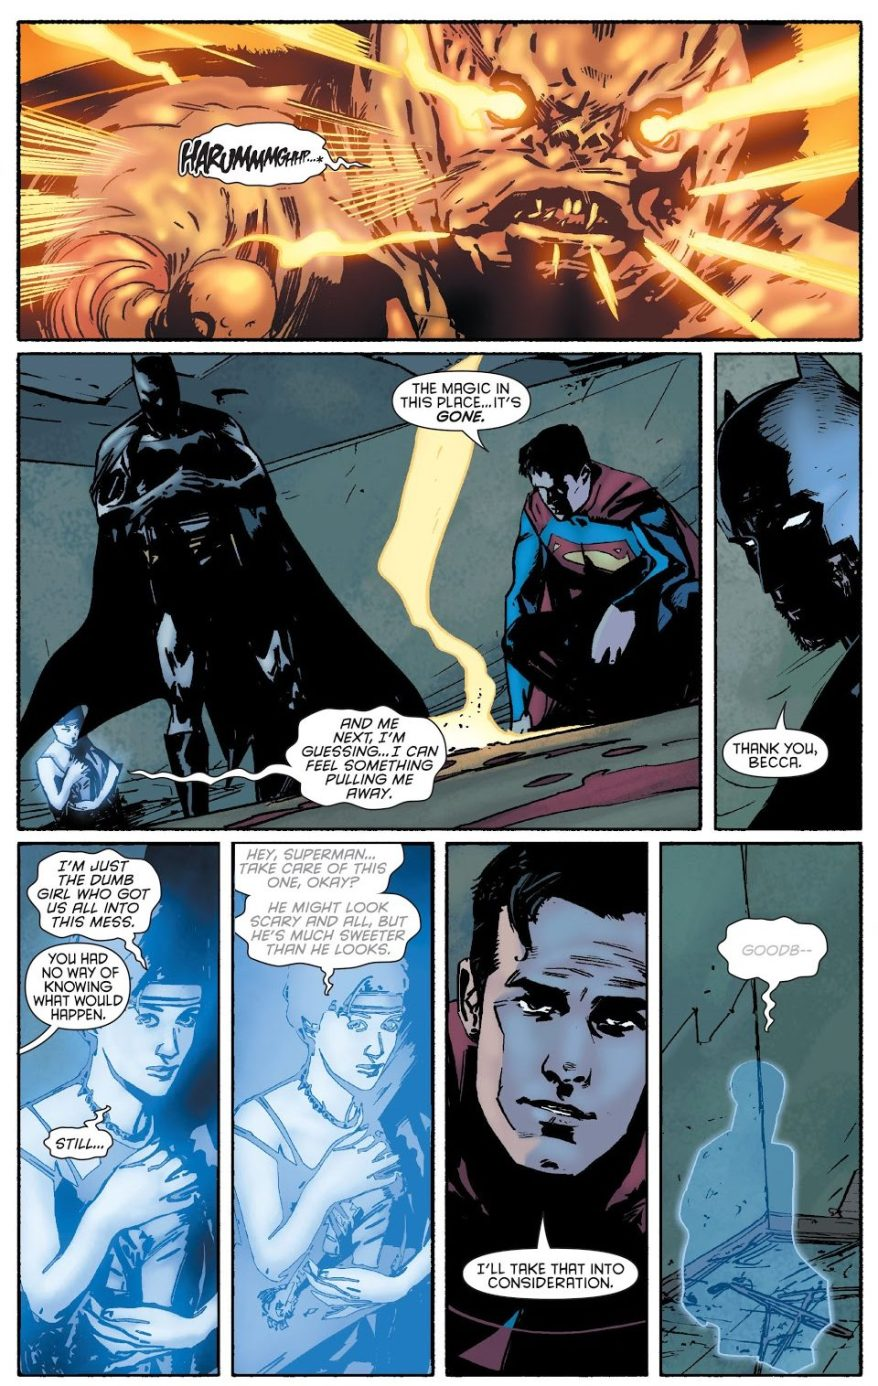 Superman And Batman VS Will O' the Wisp